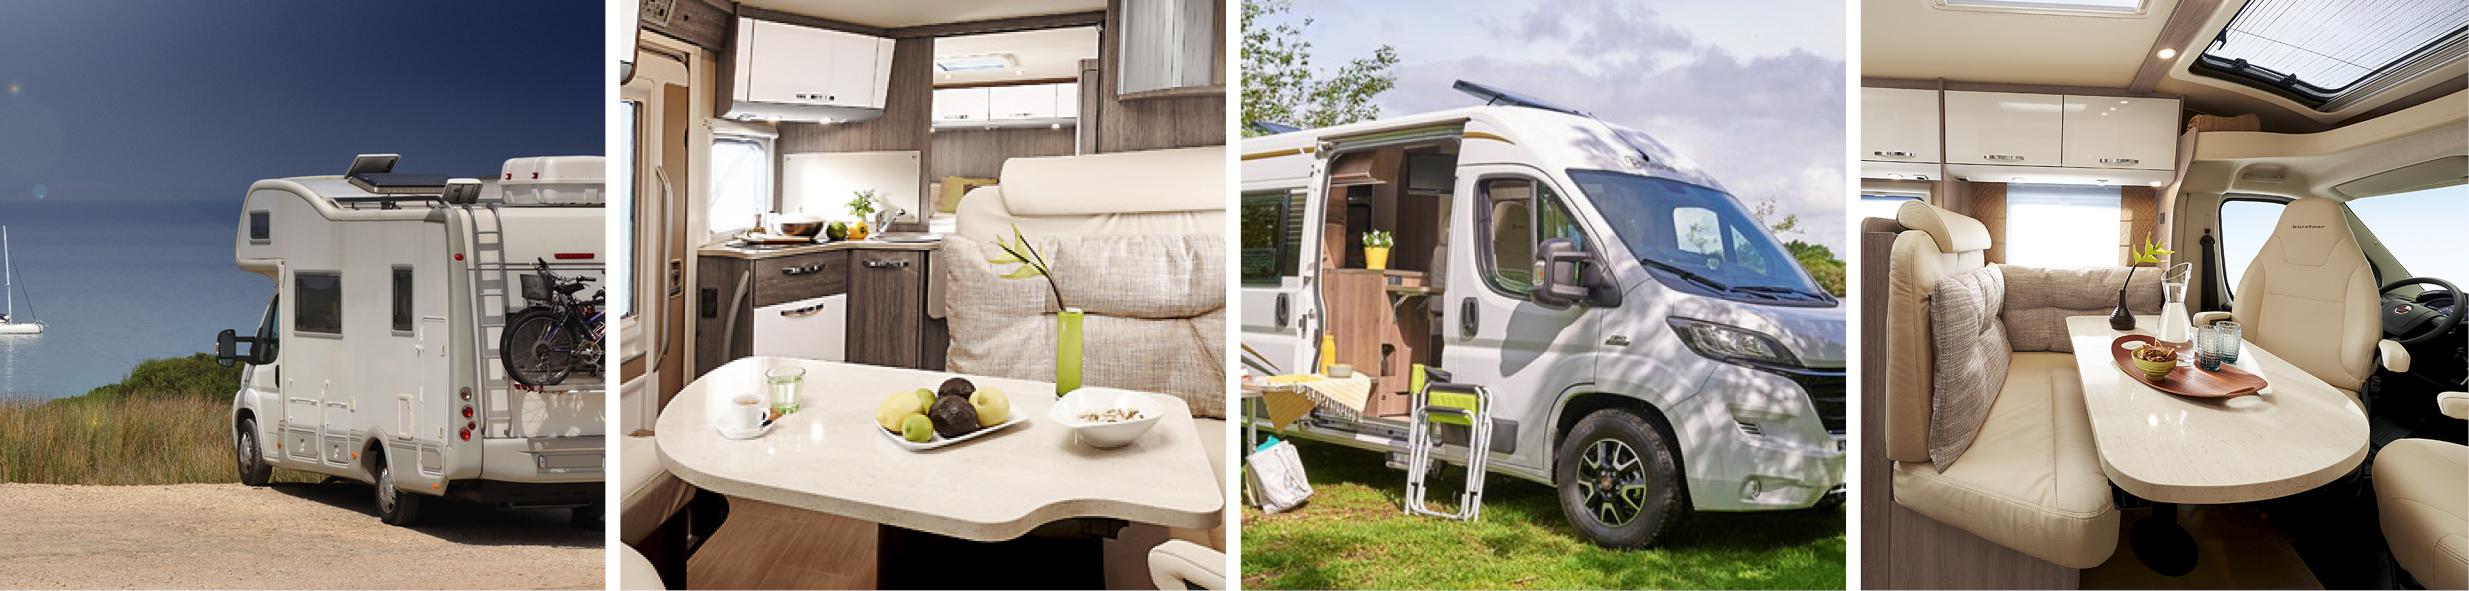 Bandeau - Camping-cars.jpg